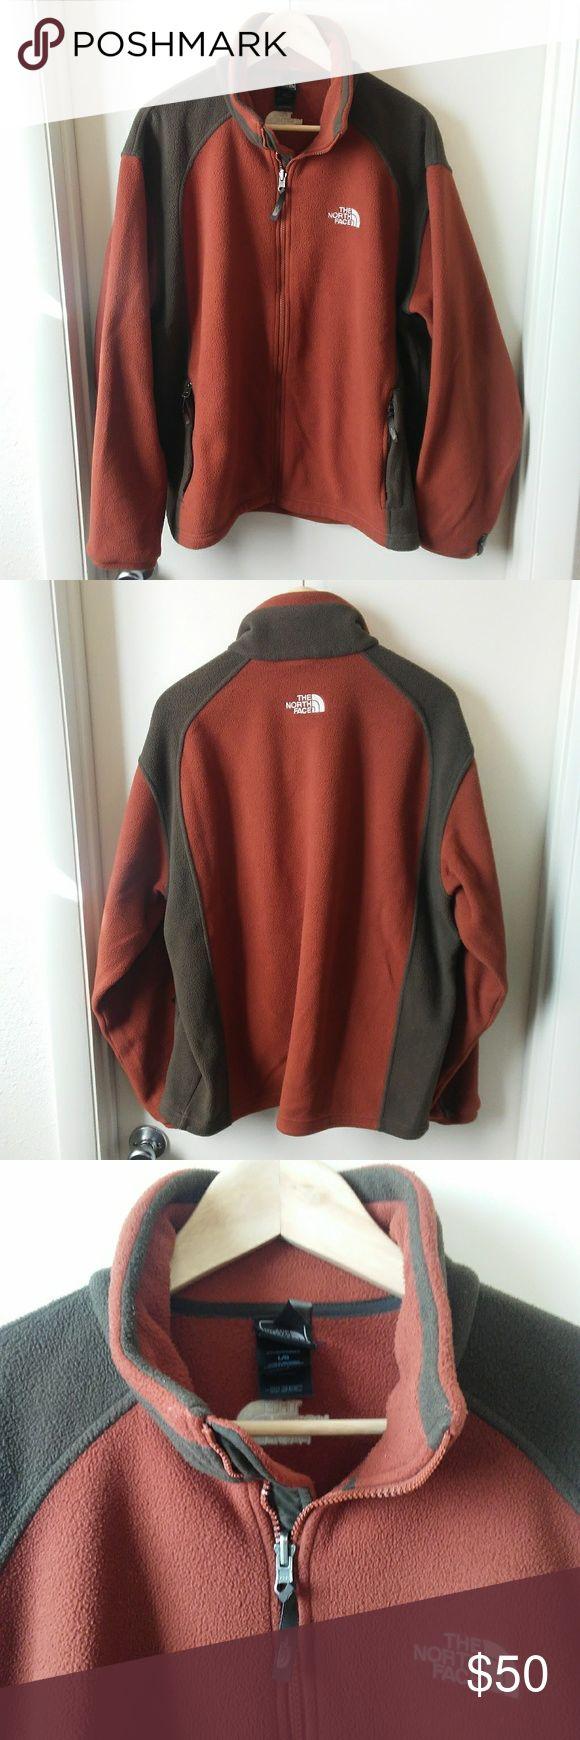 THE NORTH FACE Full-Zip Fleece Jacket The North Face full-zip fleece jacket. EUC. Has two zippered pockets in front. The North Face Jackets & Coats